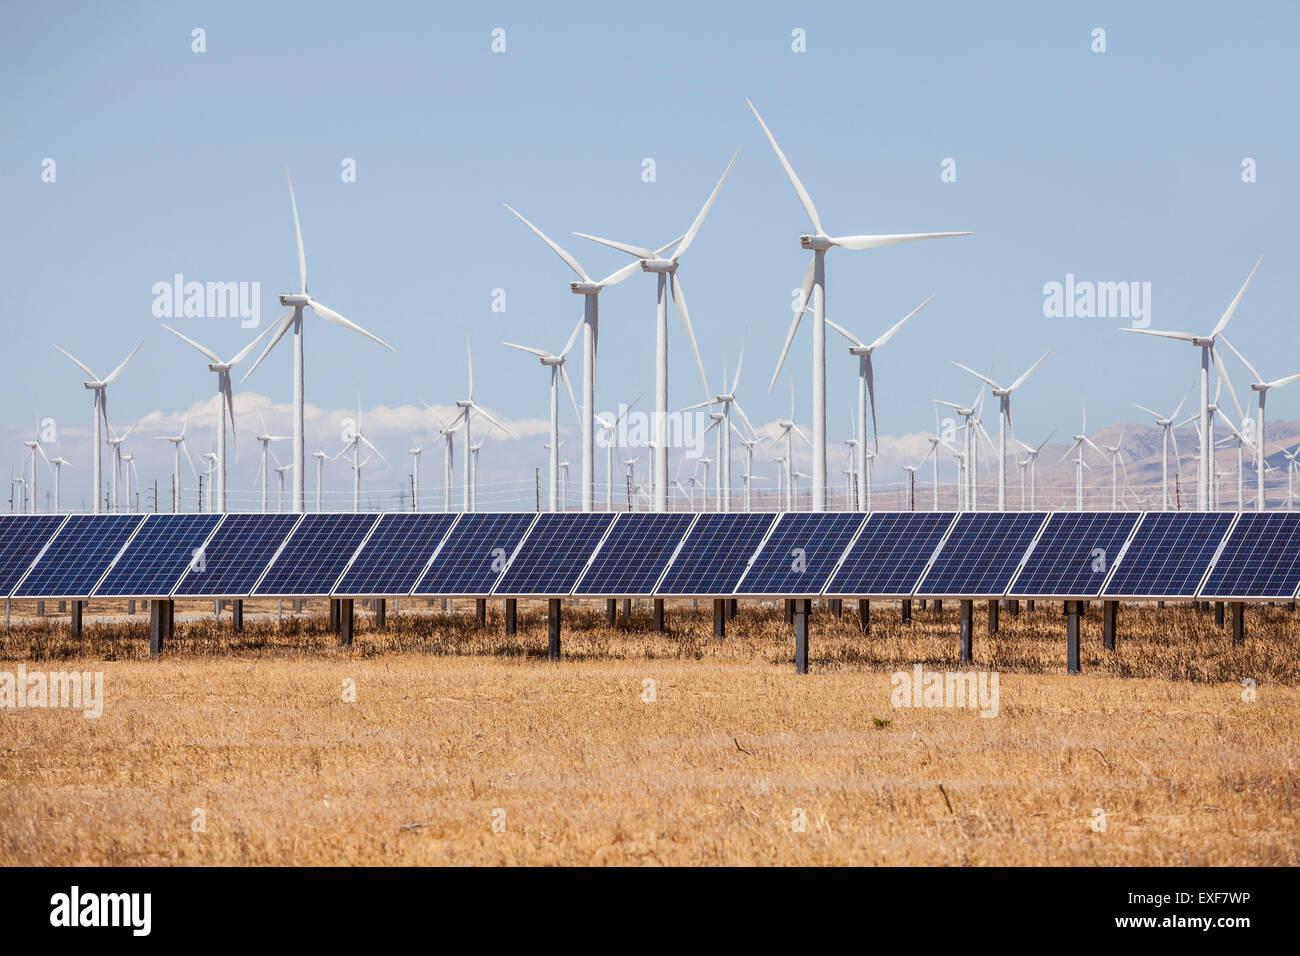 Wind mills and solar panels alternative energy production. - Stock Image